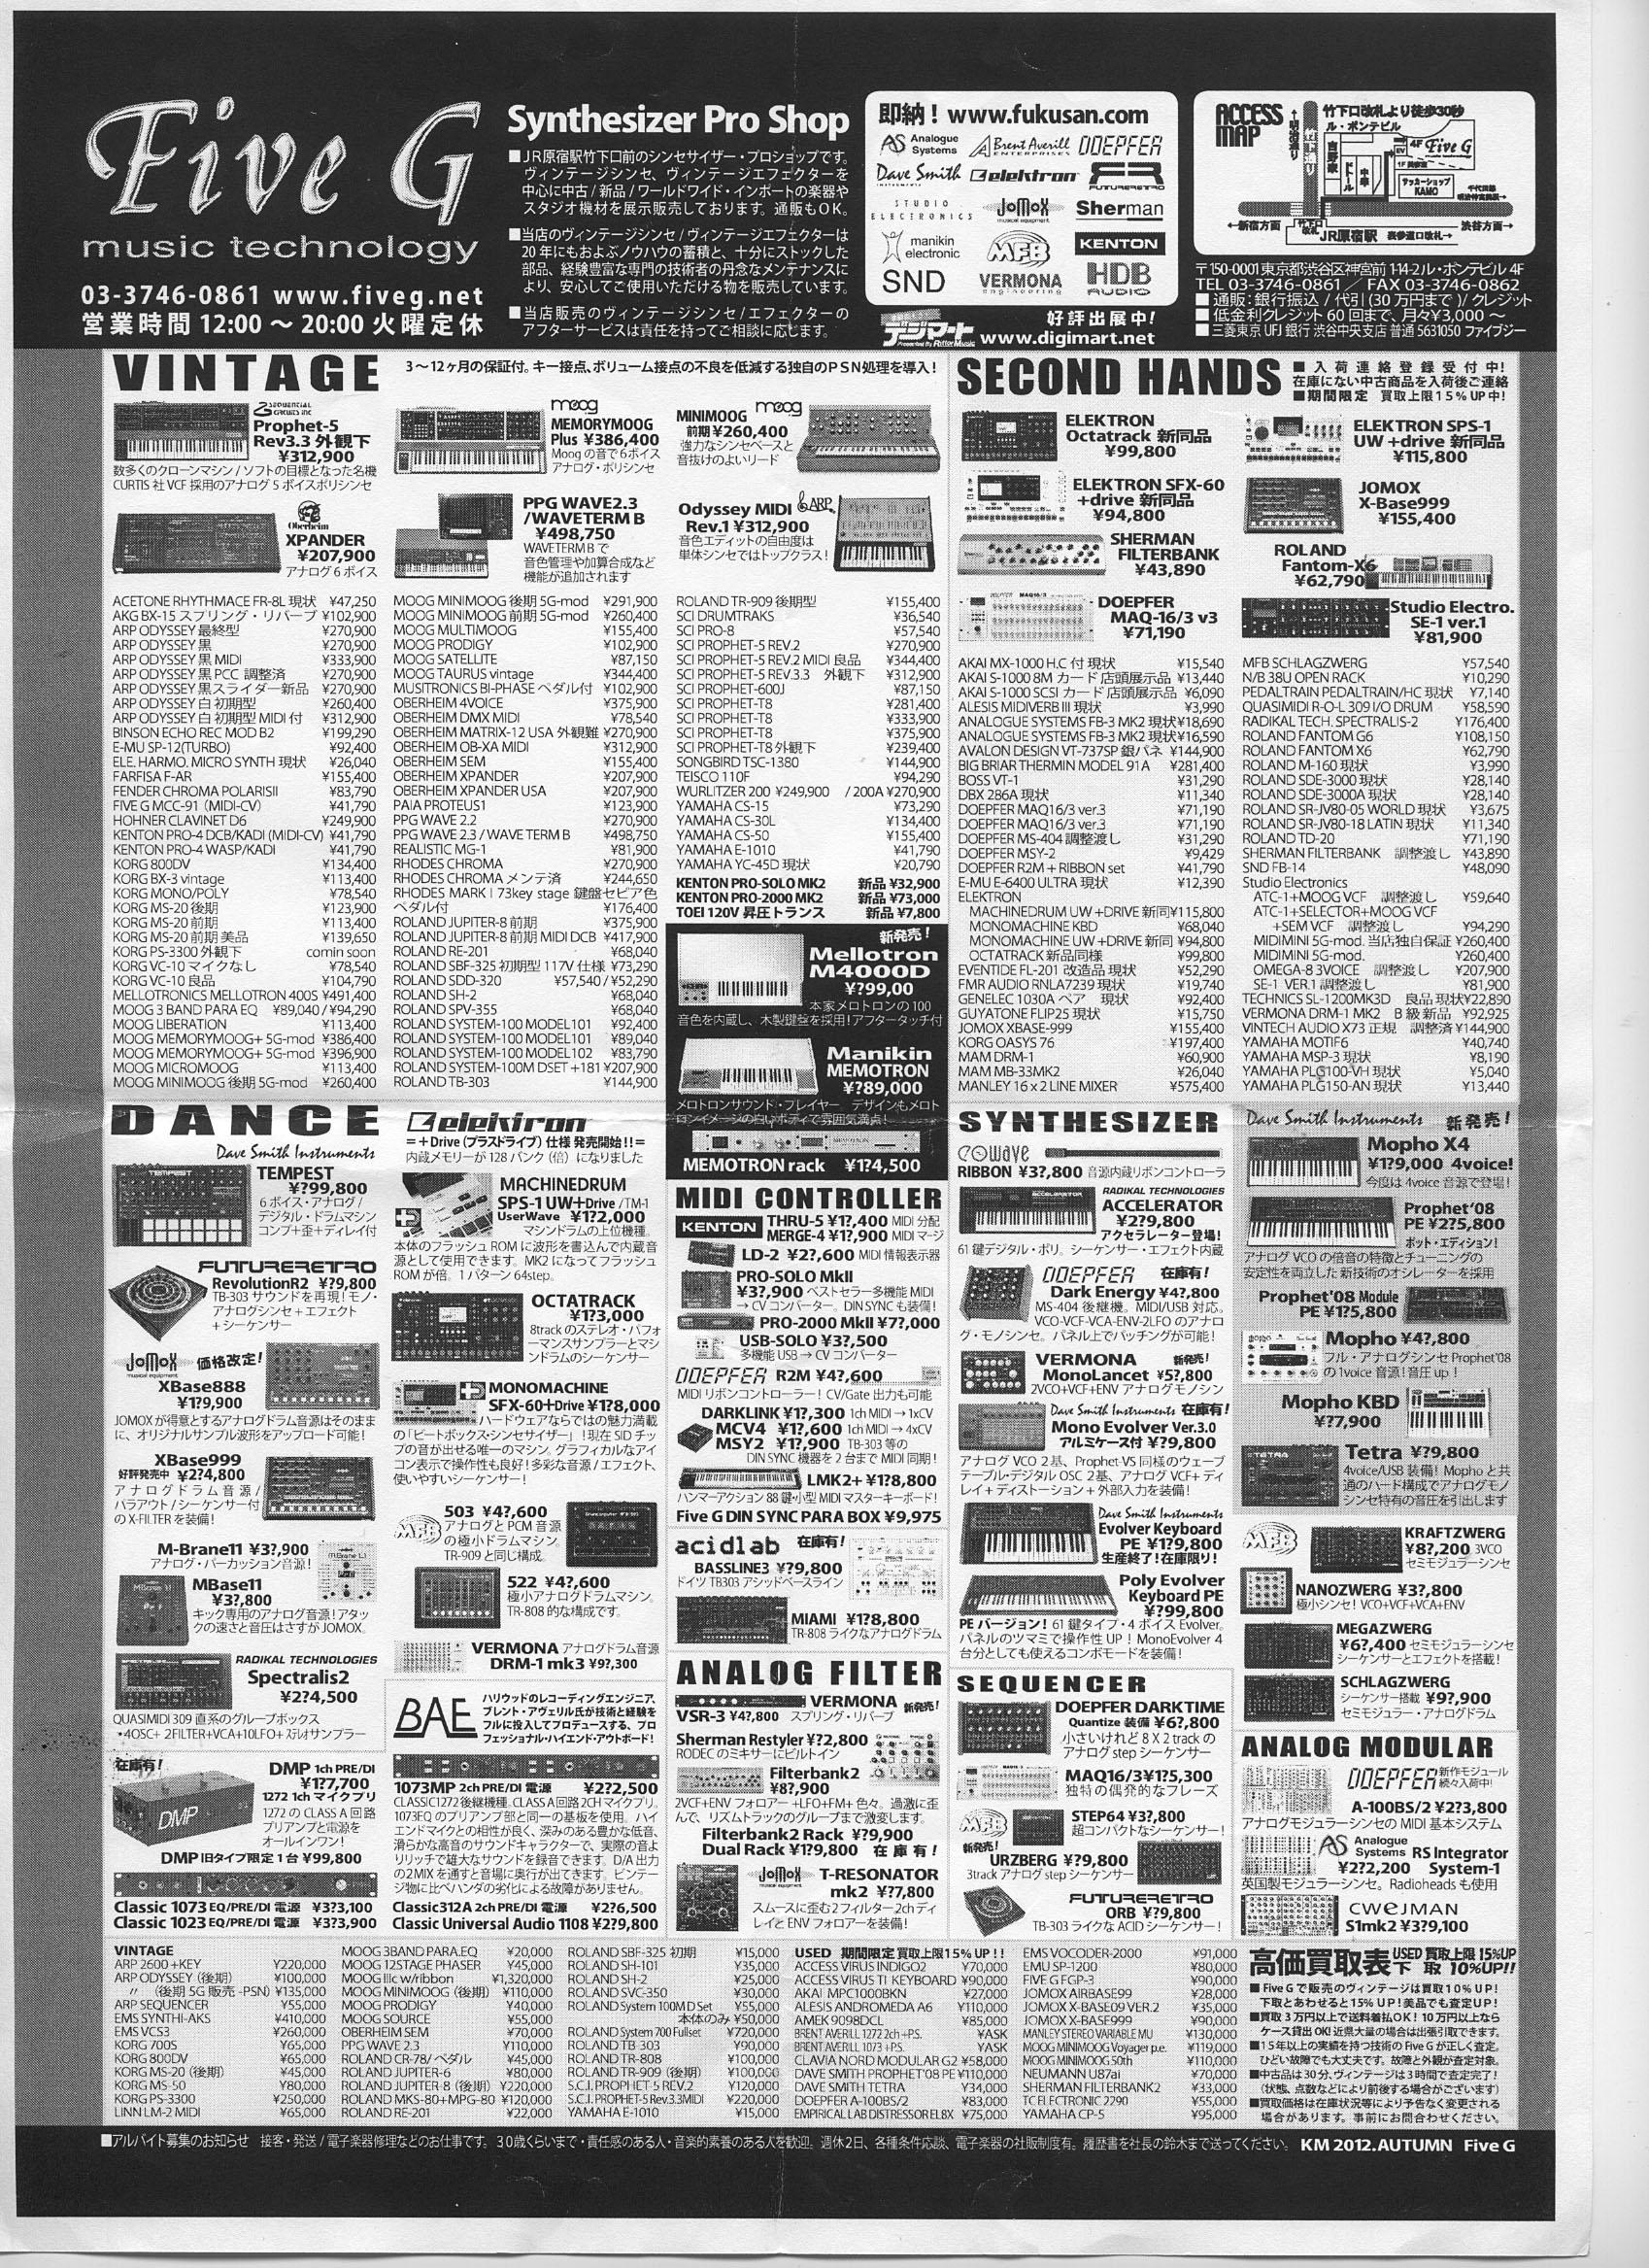 FIVE G (Hirijuku vintage/new synthesizer shop) price list KM 2012.AUTUMN